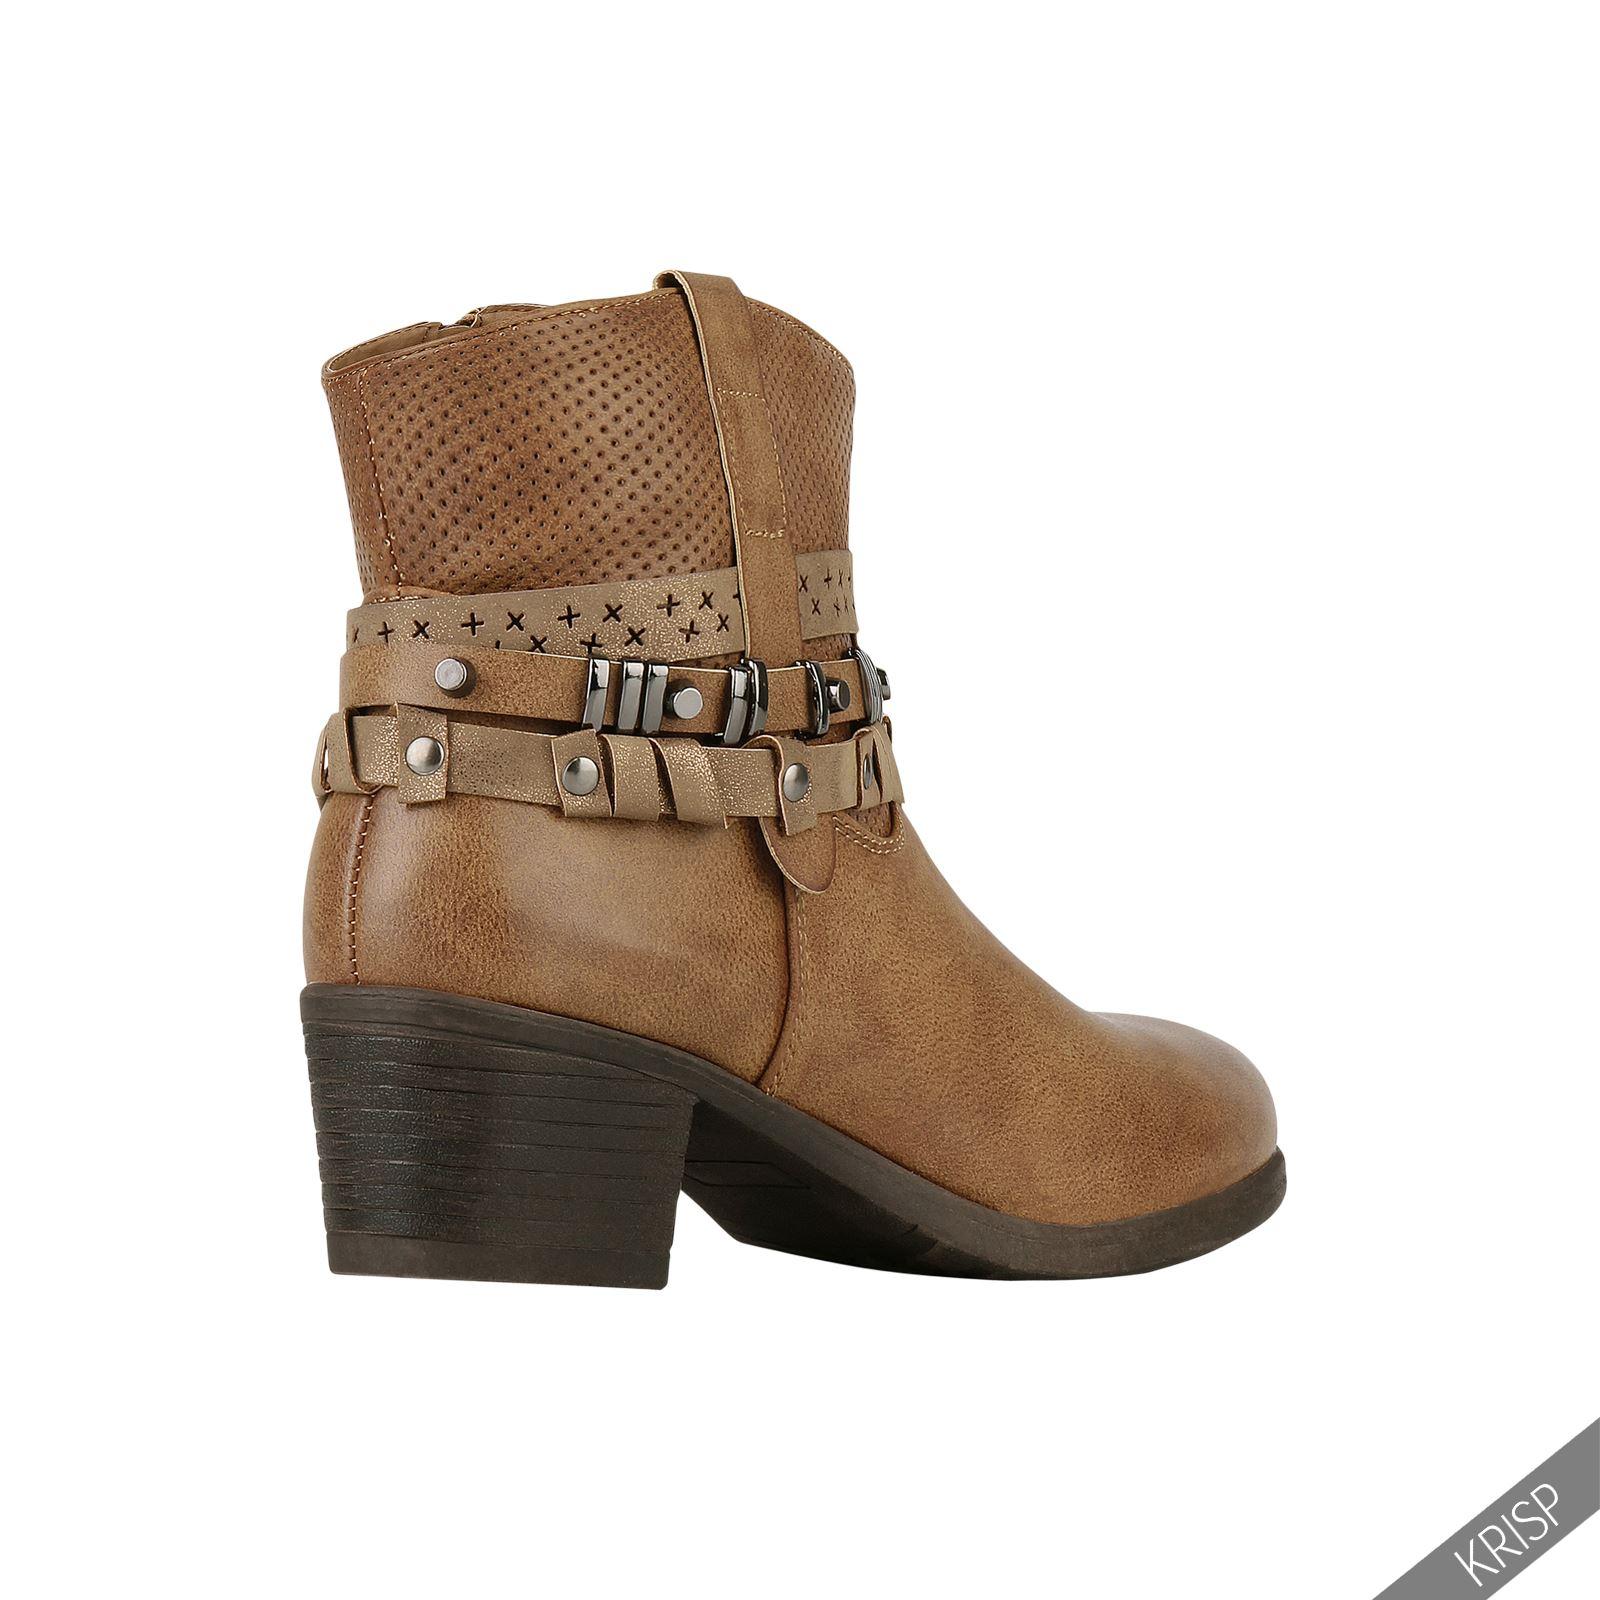 damen wildleder chealsea schuhe nieten design ankle boots. Black Bedroom Furniture Sets. Home Design Ideas